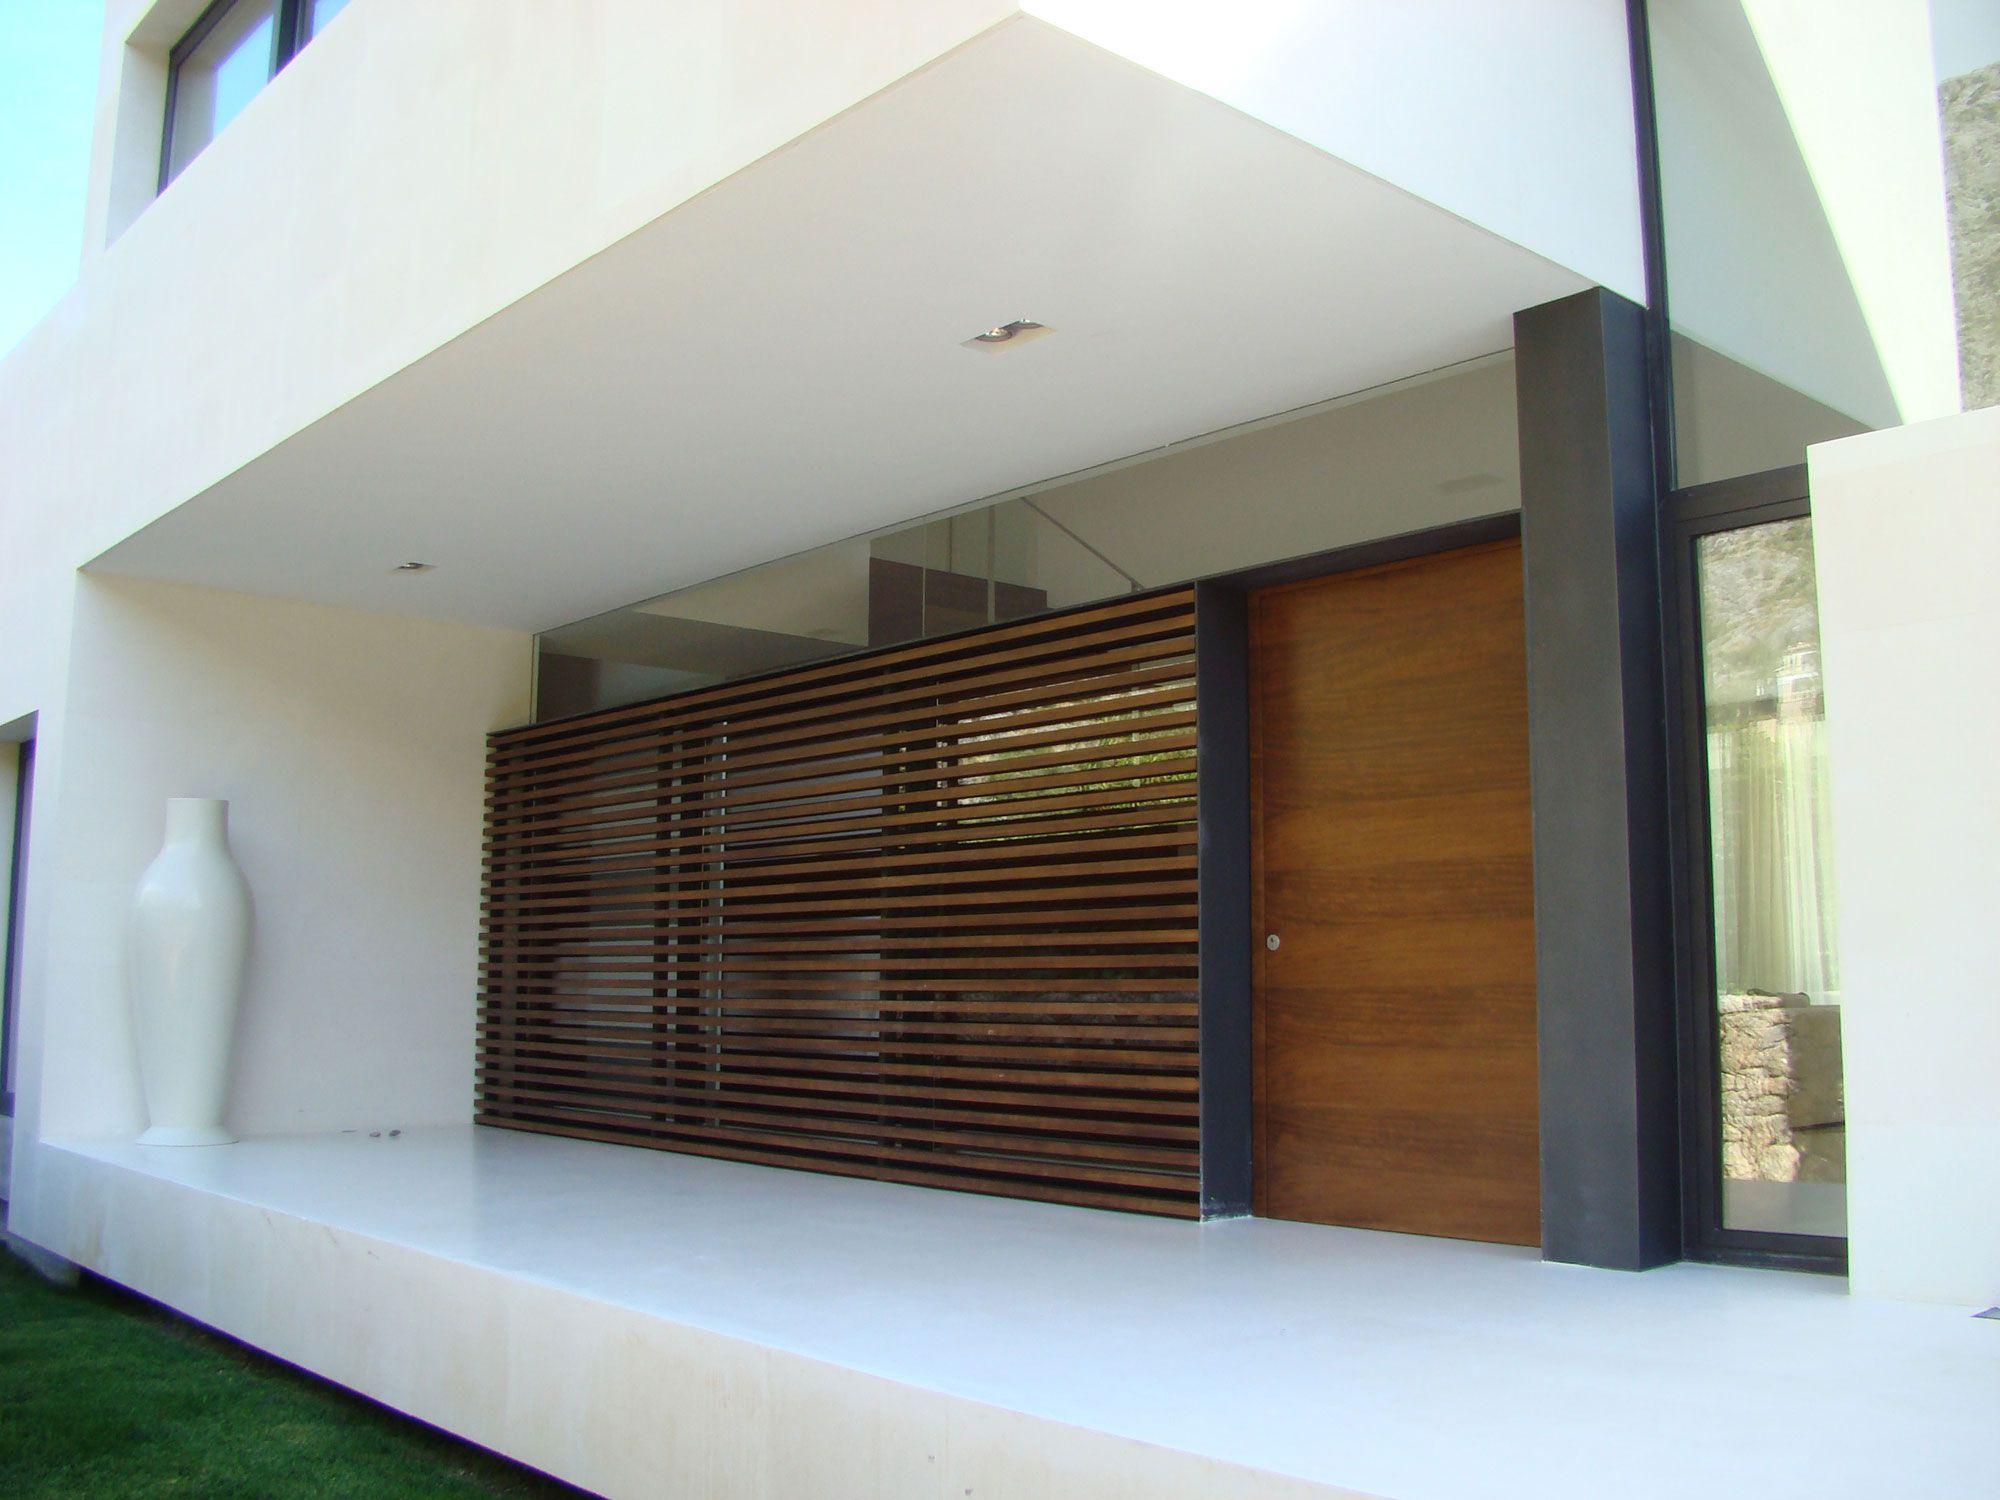 Casa-Bauzà-05